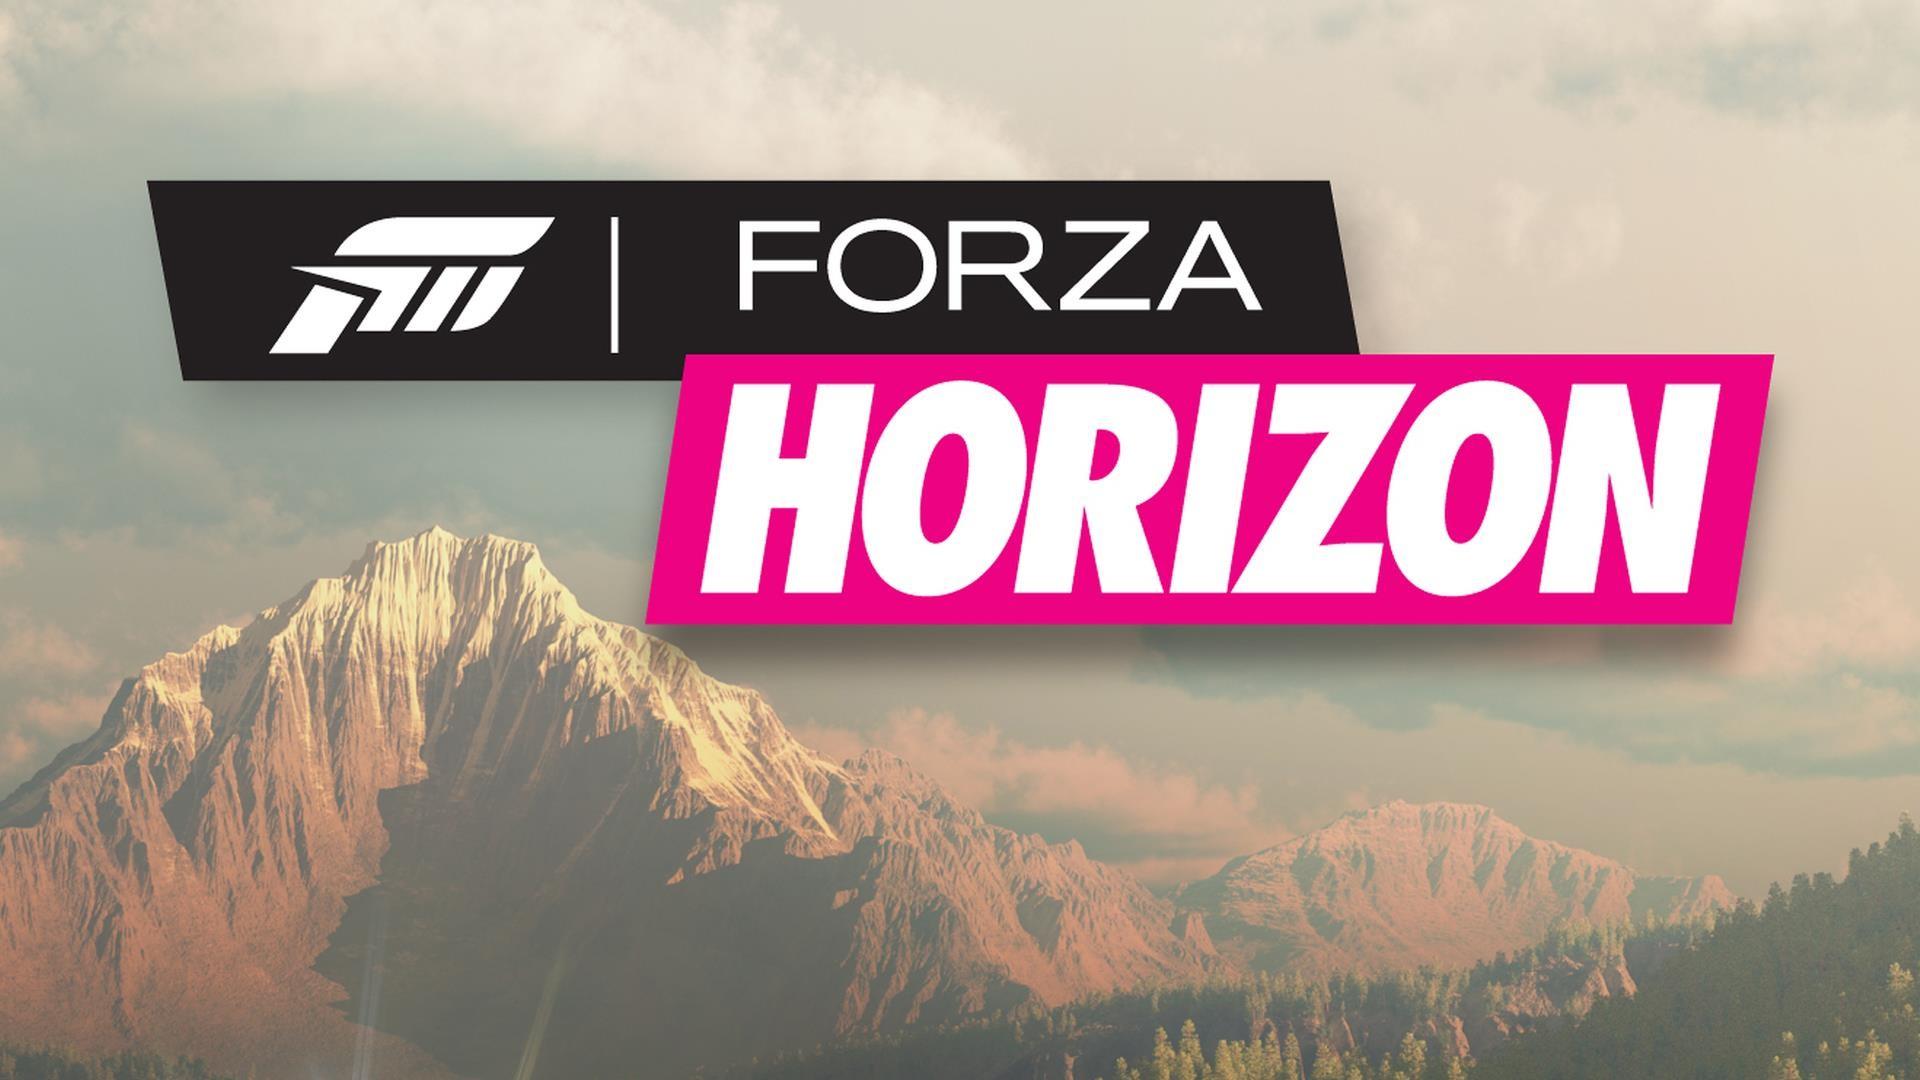 Forza Horizon Logo By AcerSense